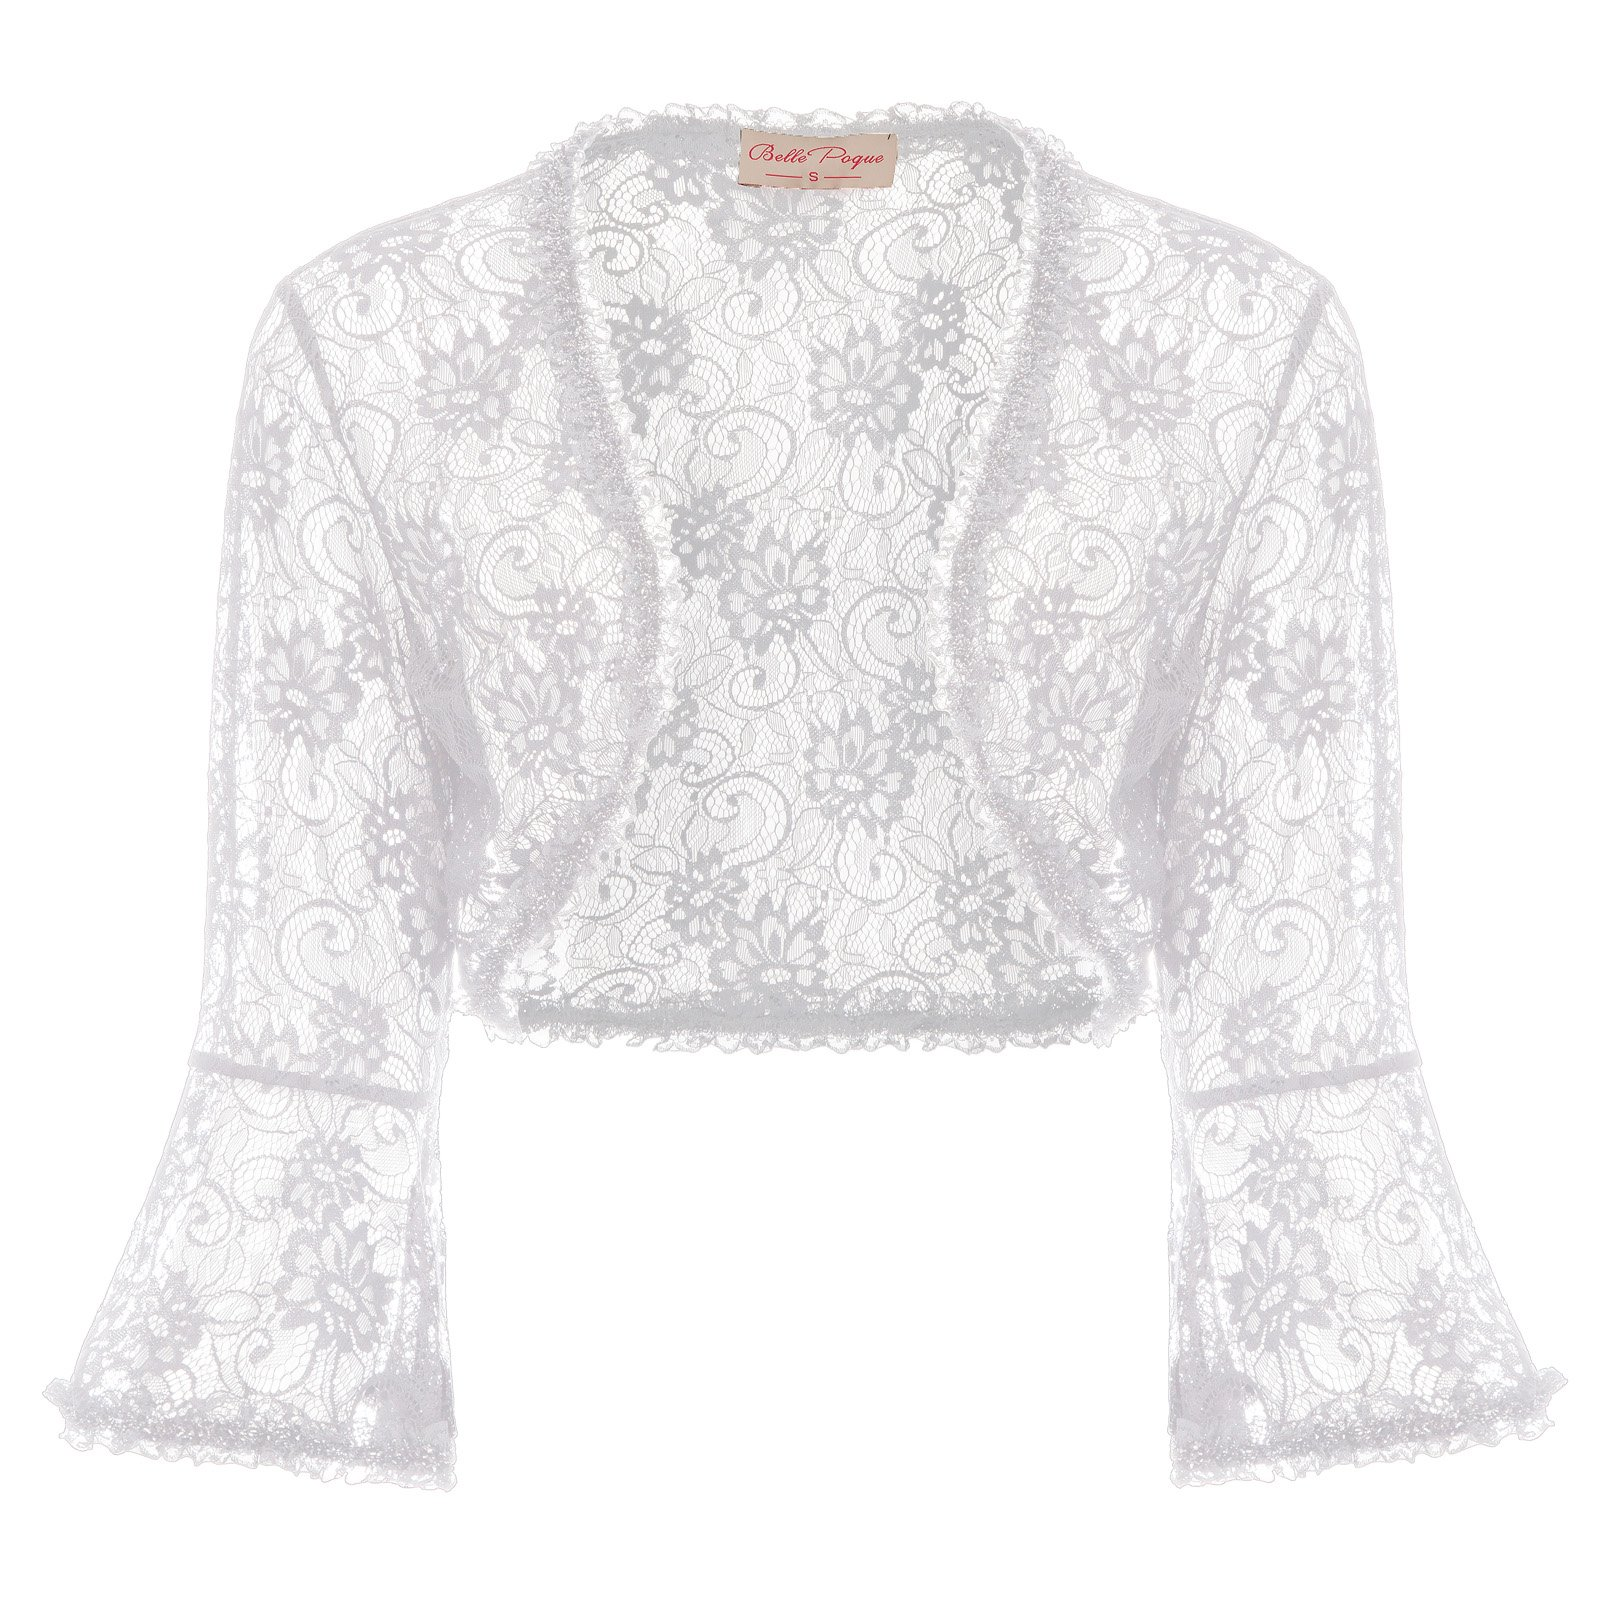 JS Fashion Vintage Dress Ladies Floral Lace Shrug Bolero Cardigan Crop Top (XXL, White 593-2)